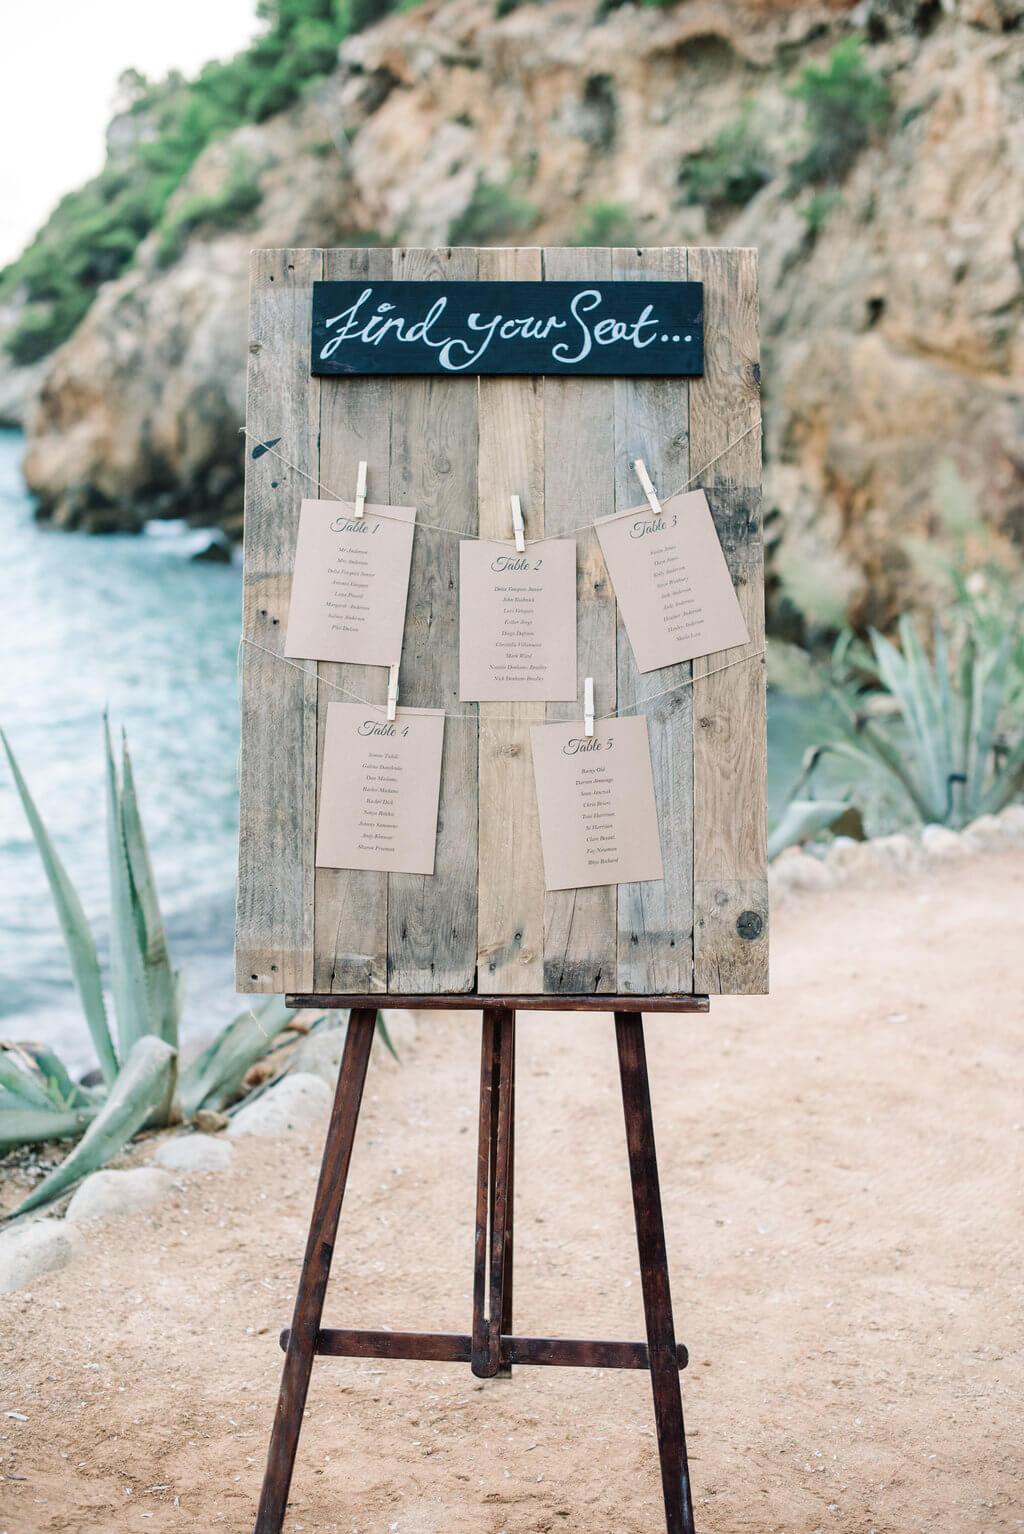 https://www.white-ibiza.com/wp-content/uploads/2020/03/ibiza-wedding-venues-amante-ibiza-2020-02.jpg